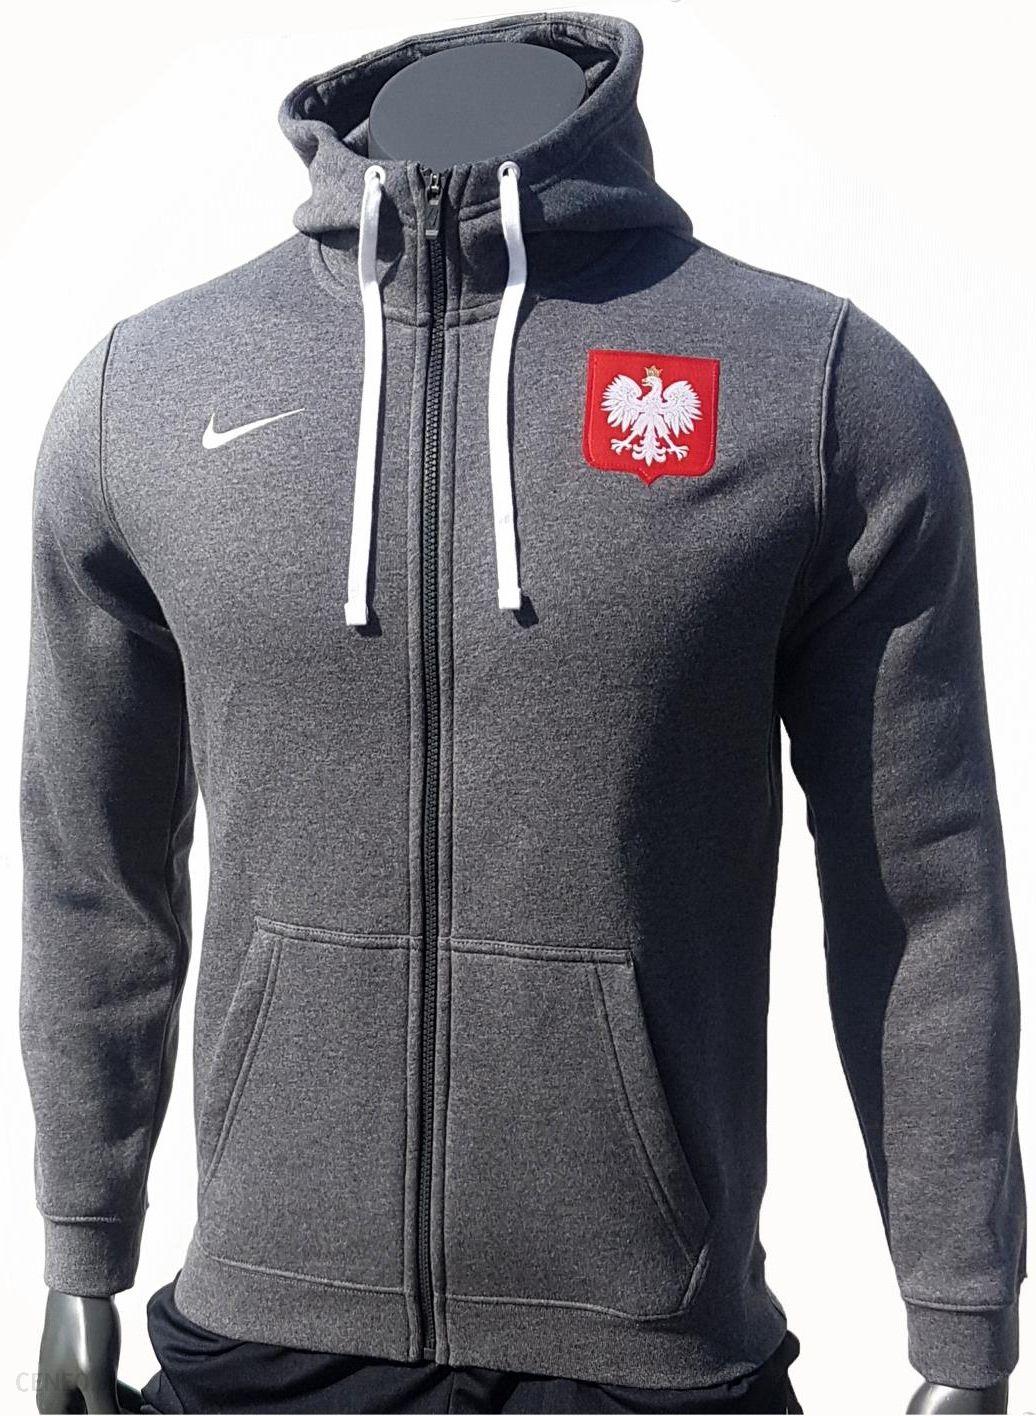 Nike bluza męska JORDAN 237 FZ HOODY, szara, roz. L